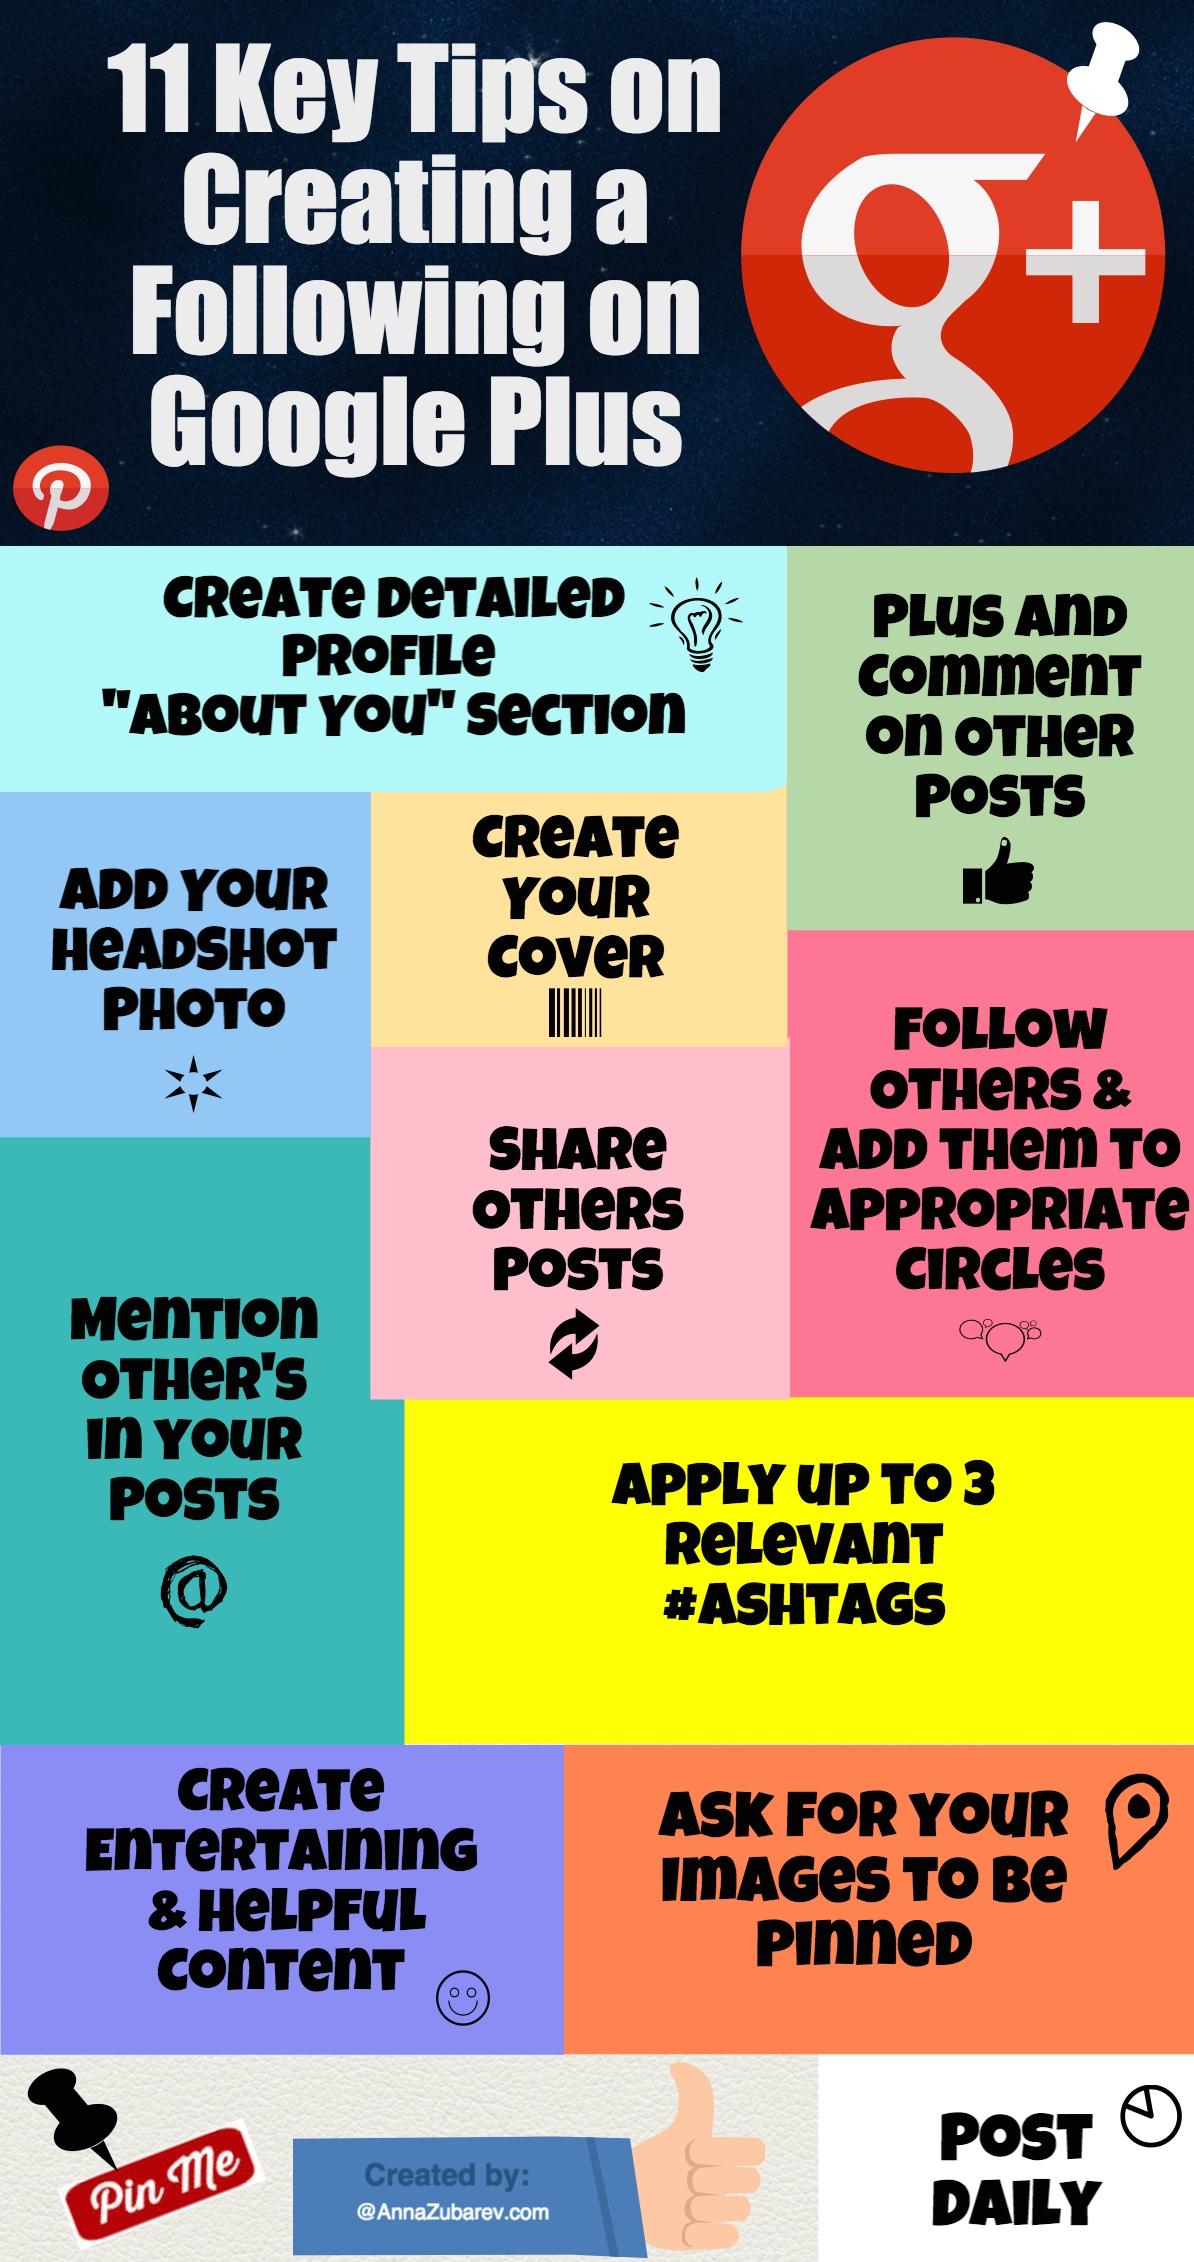 11 Key Tips on Creating a Following on Google Plus. #socialmediastrategy #infographic via@AnnaZubarev